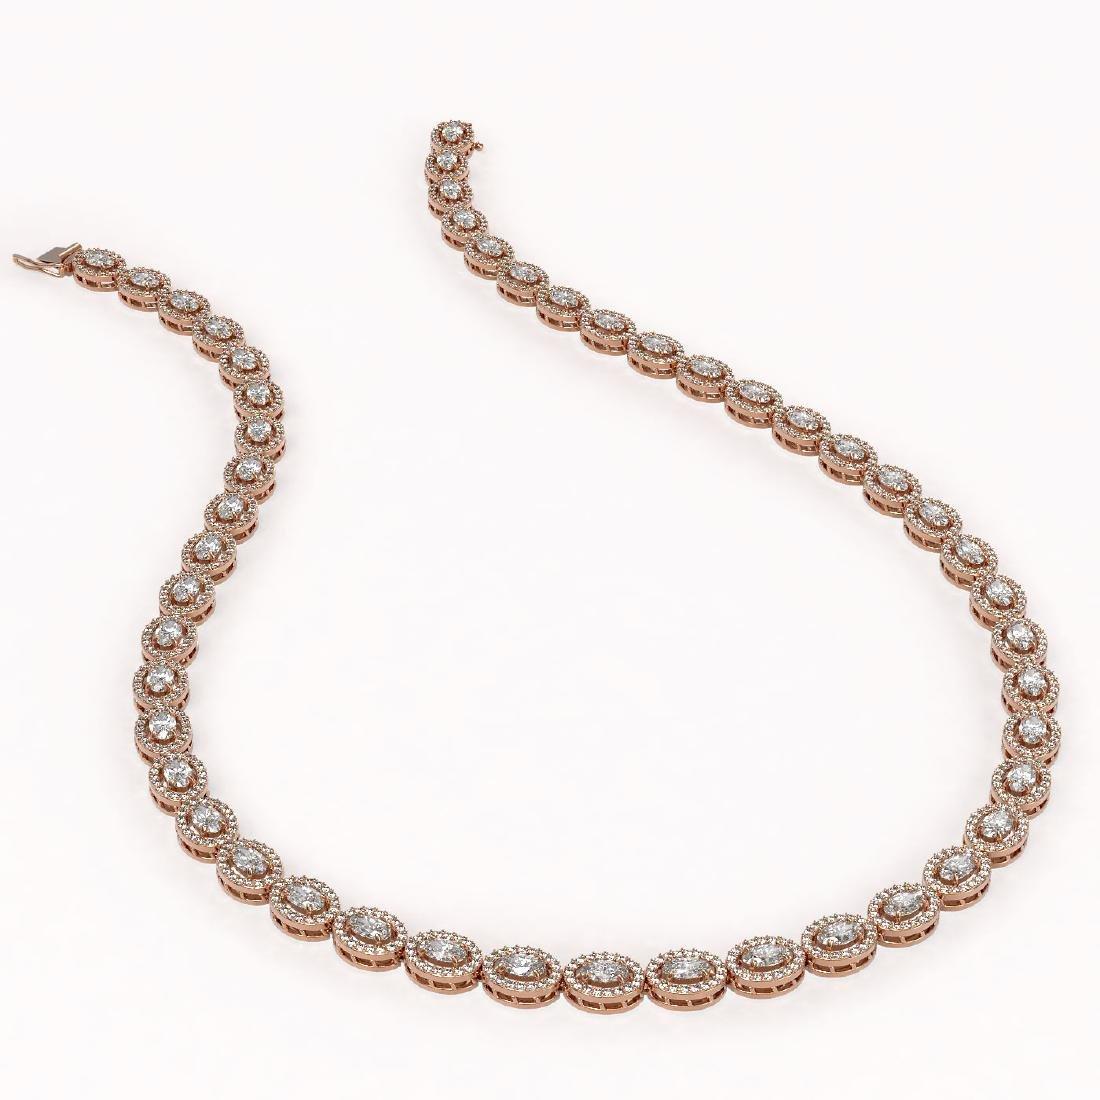 18.43 ctw Oval Diamond Necklace 18K Rose Gold - - 2